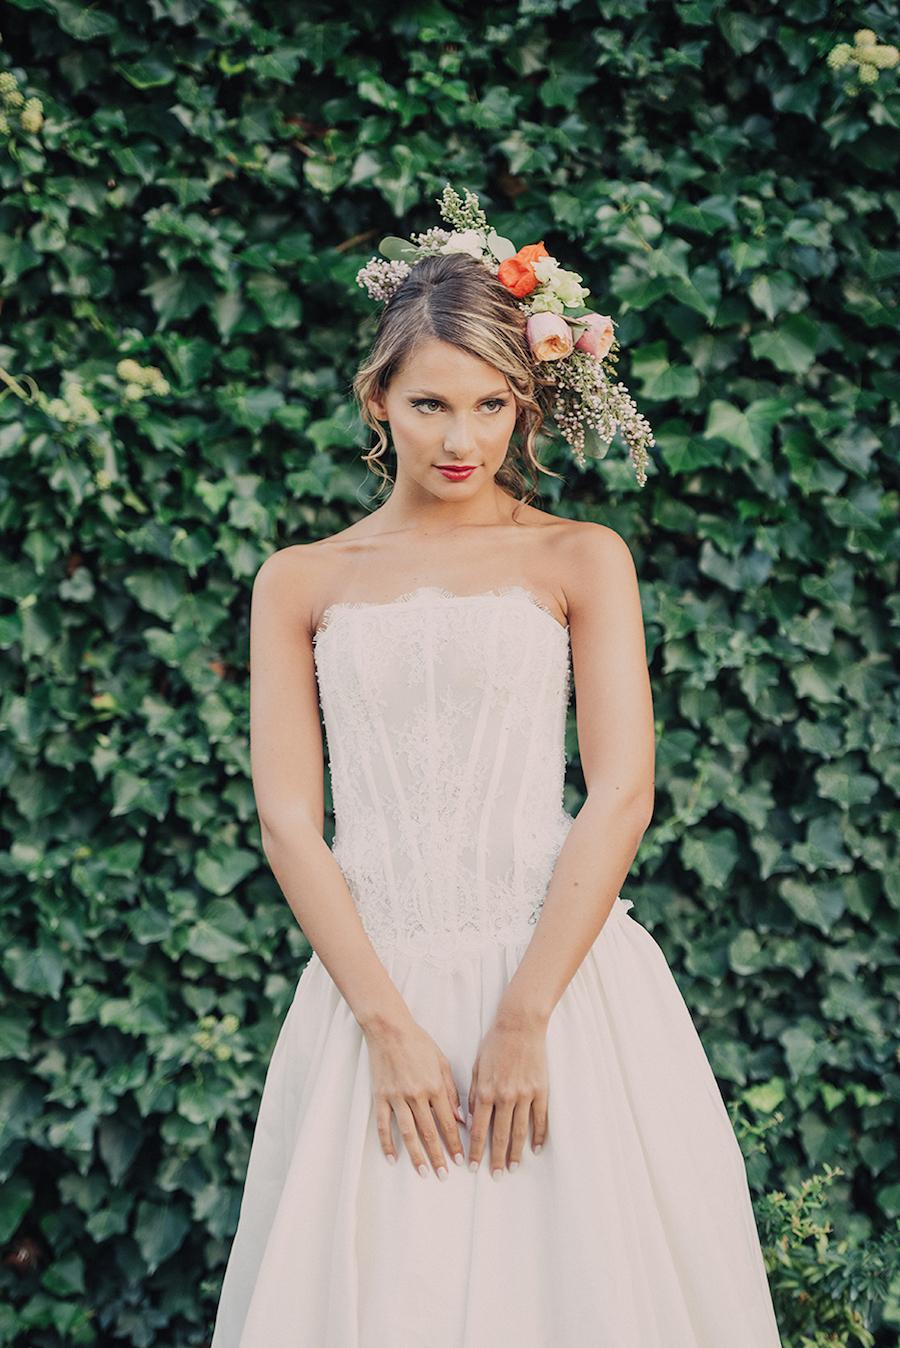 matrimonio-bucolico-boho-chic-gradisca-portento-wedding-wonderland-19